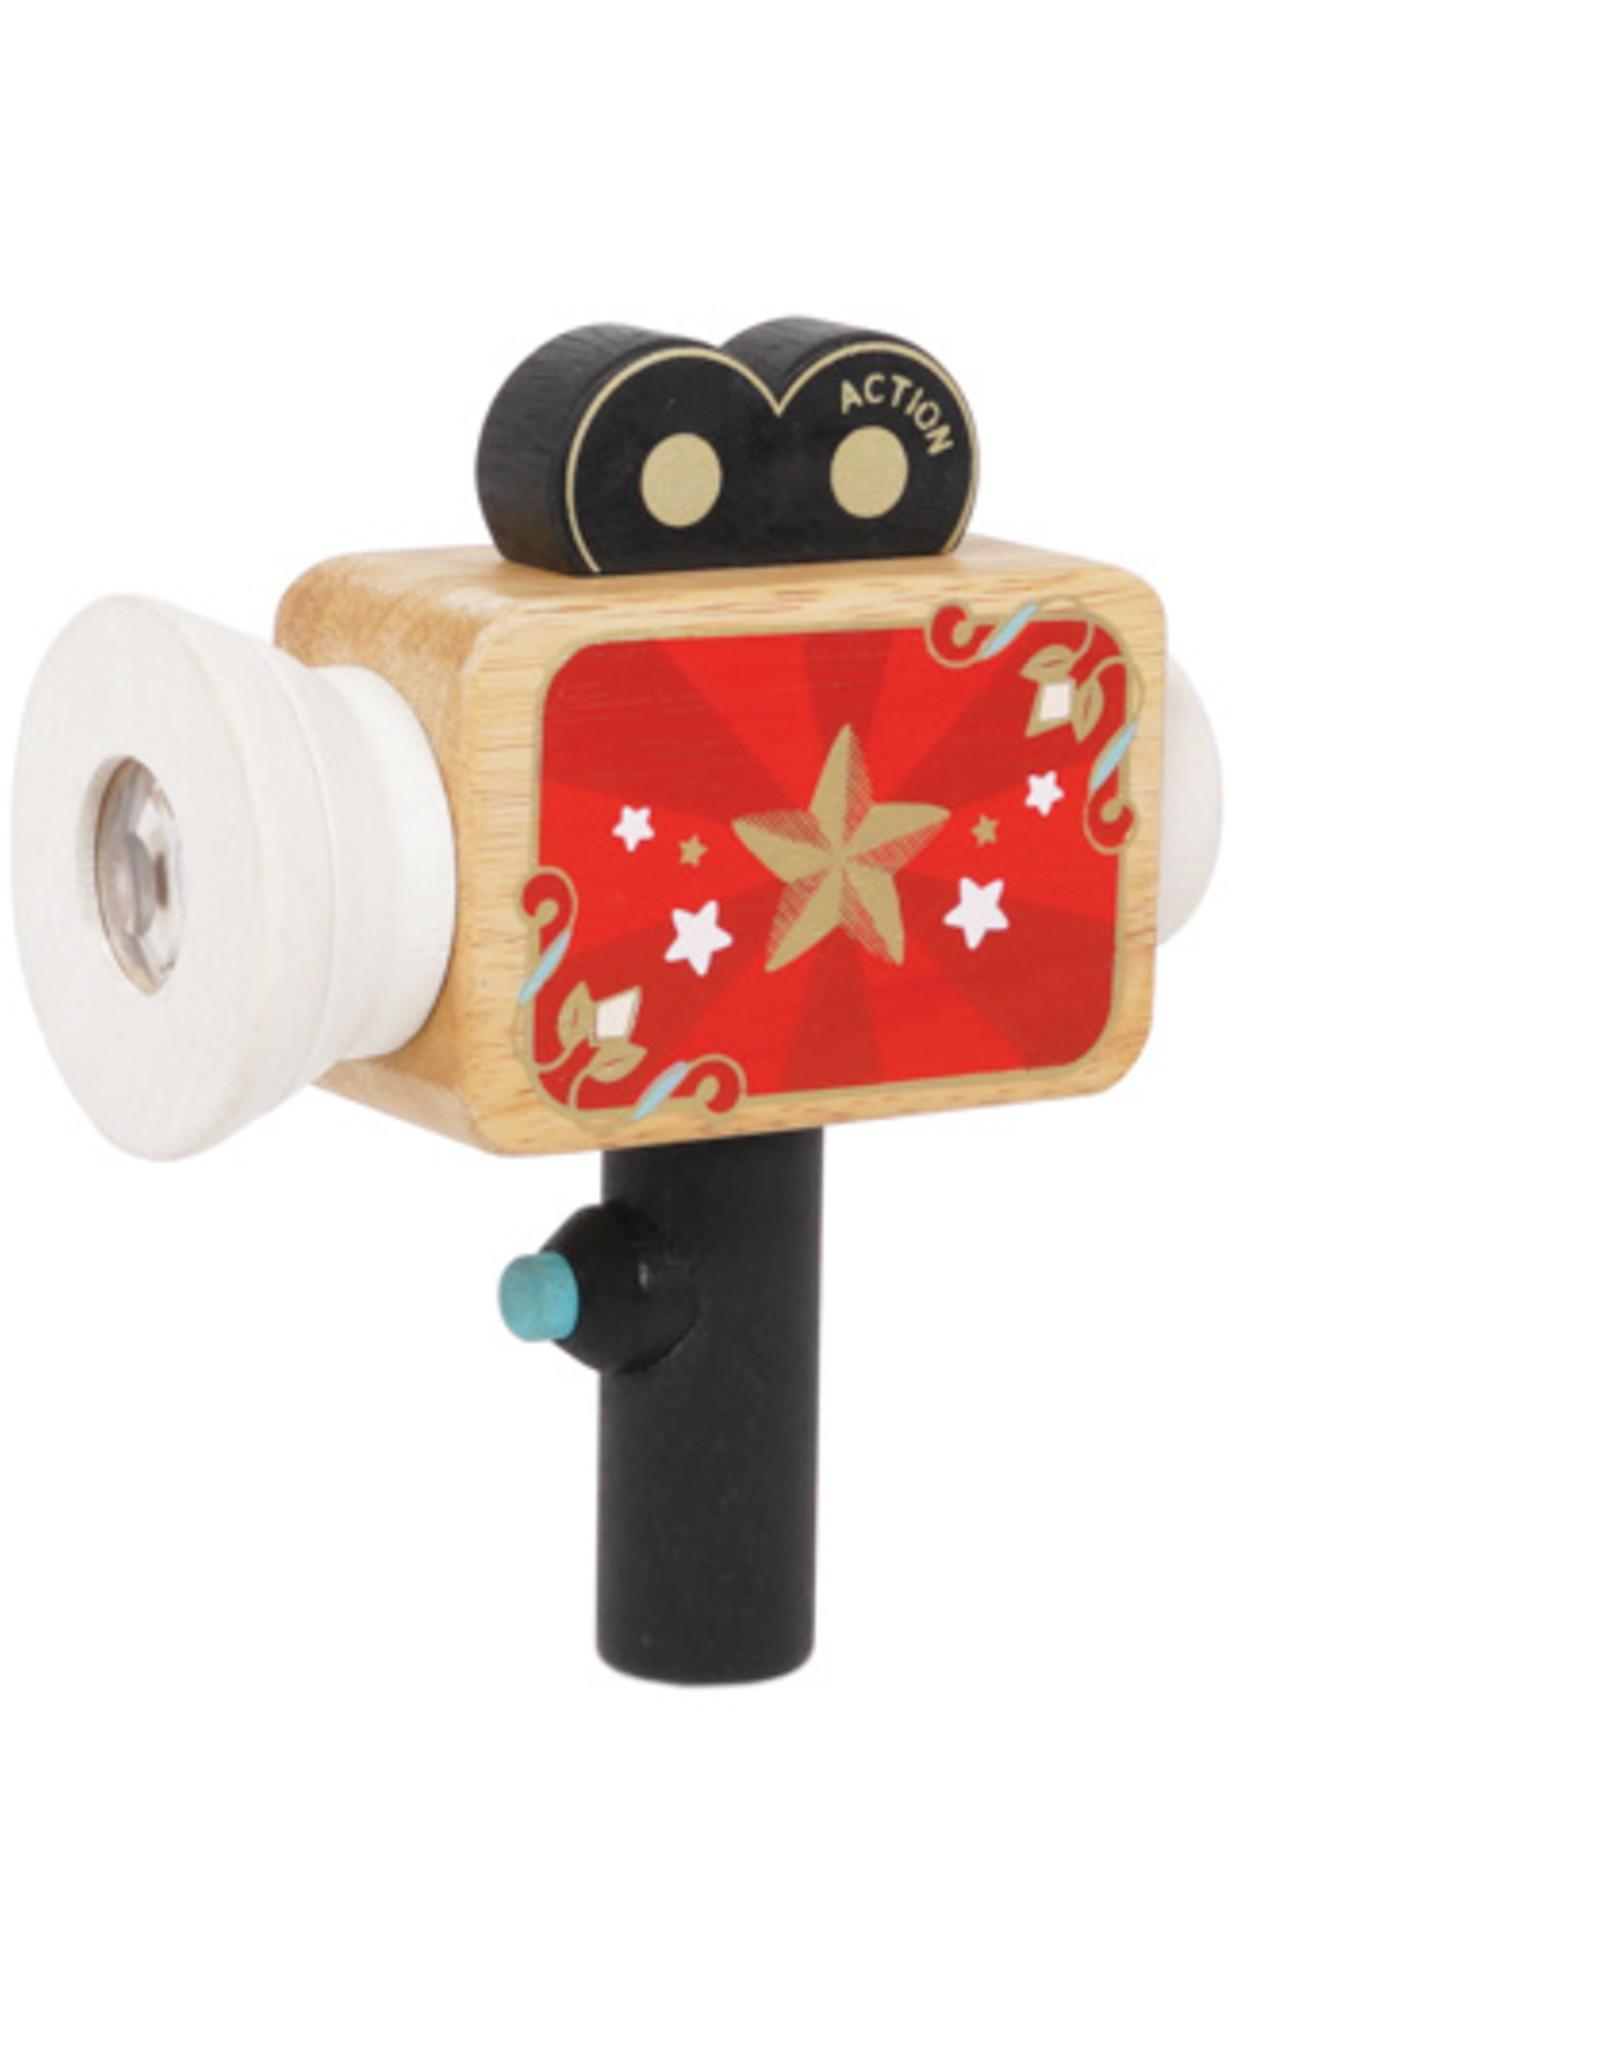 Le Toy Van Le Toy Van - Hollywood Film Camera